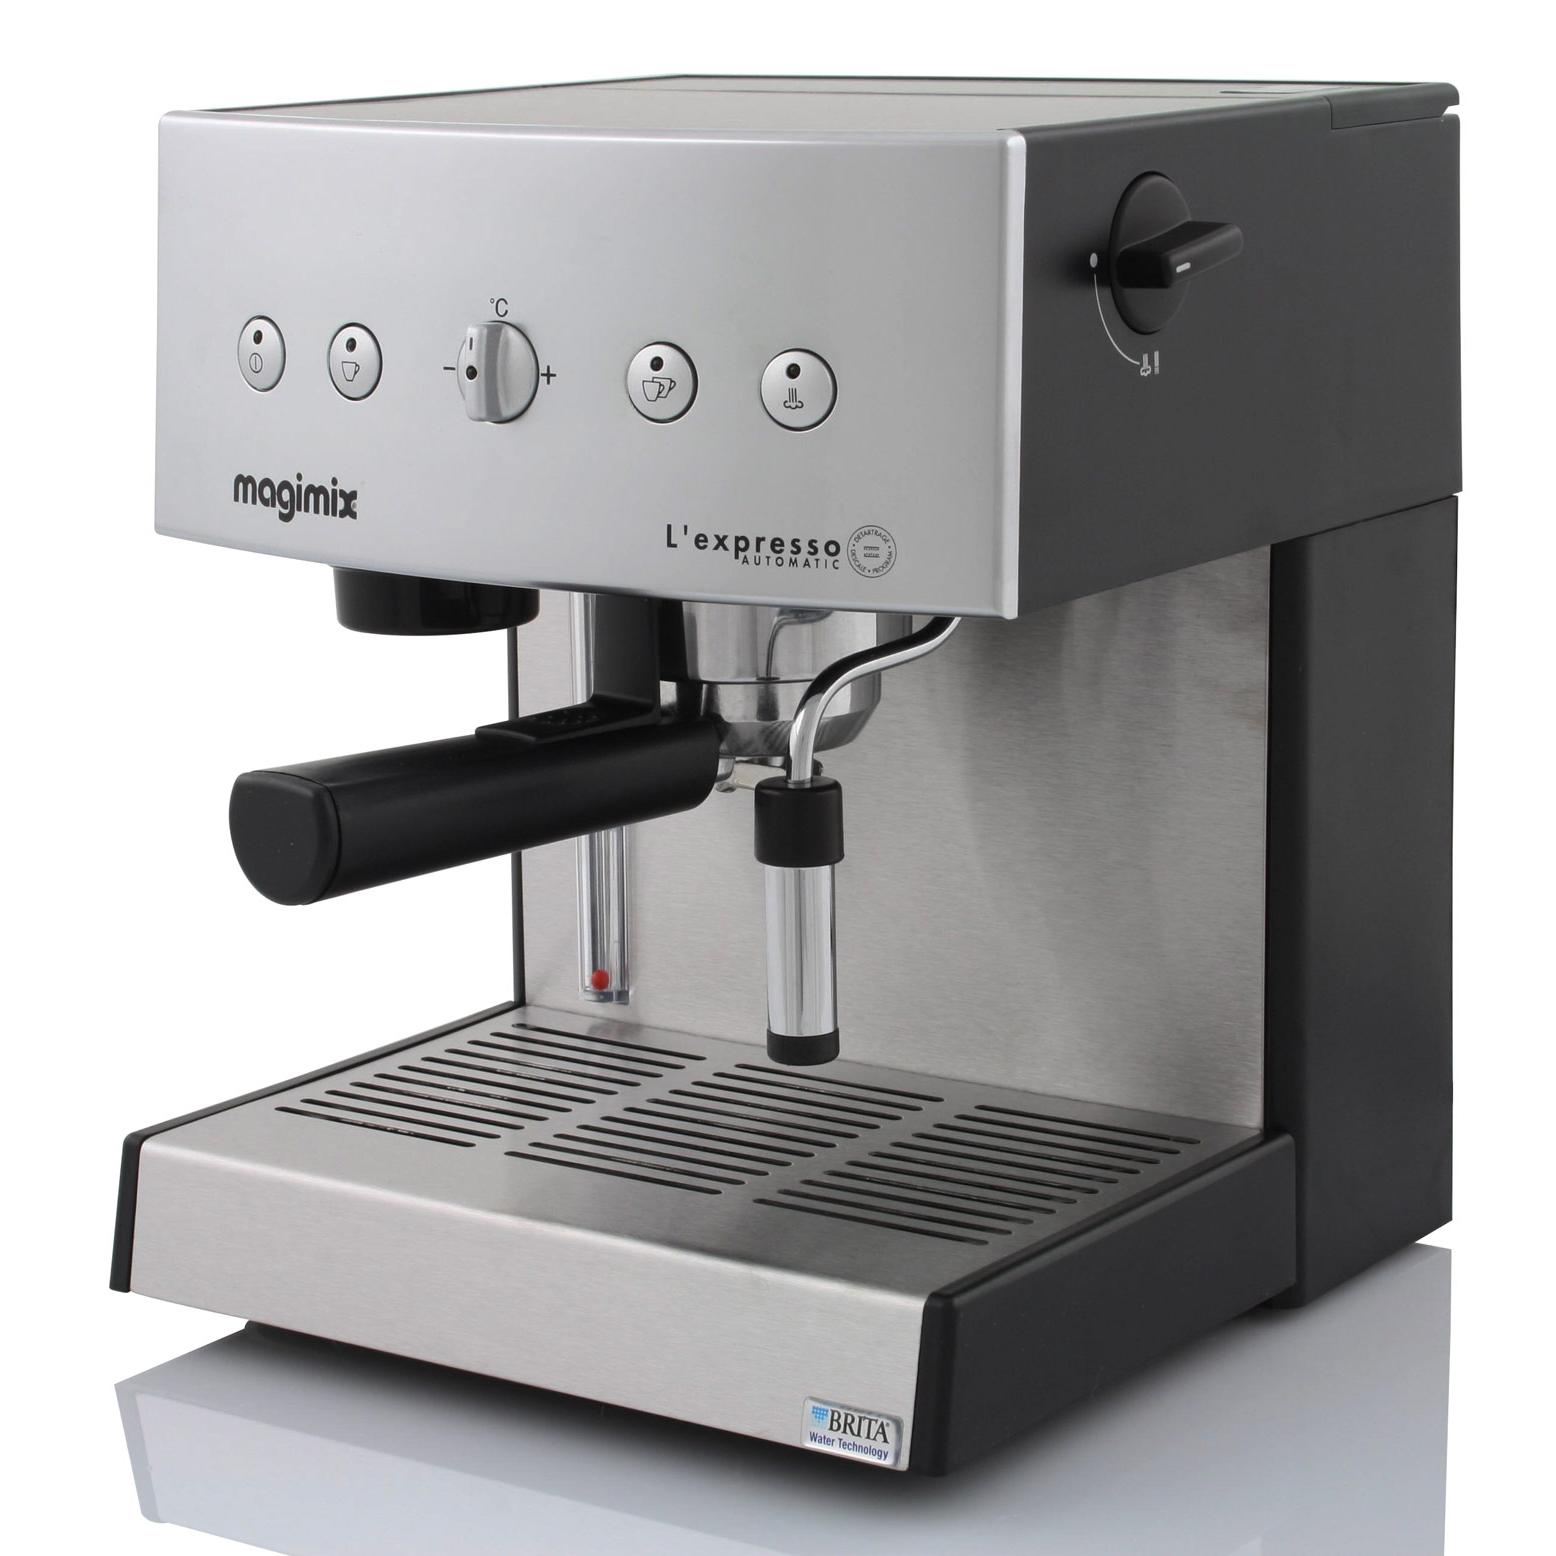 Espresso machine Compatibele Papier Pods (E.S.E) Magimix L'Expresso 11414 AUT